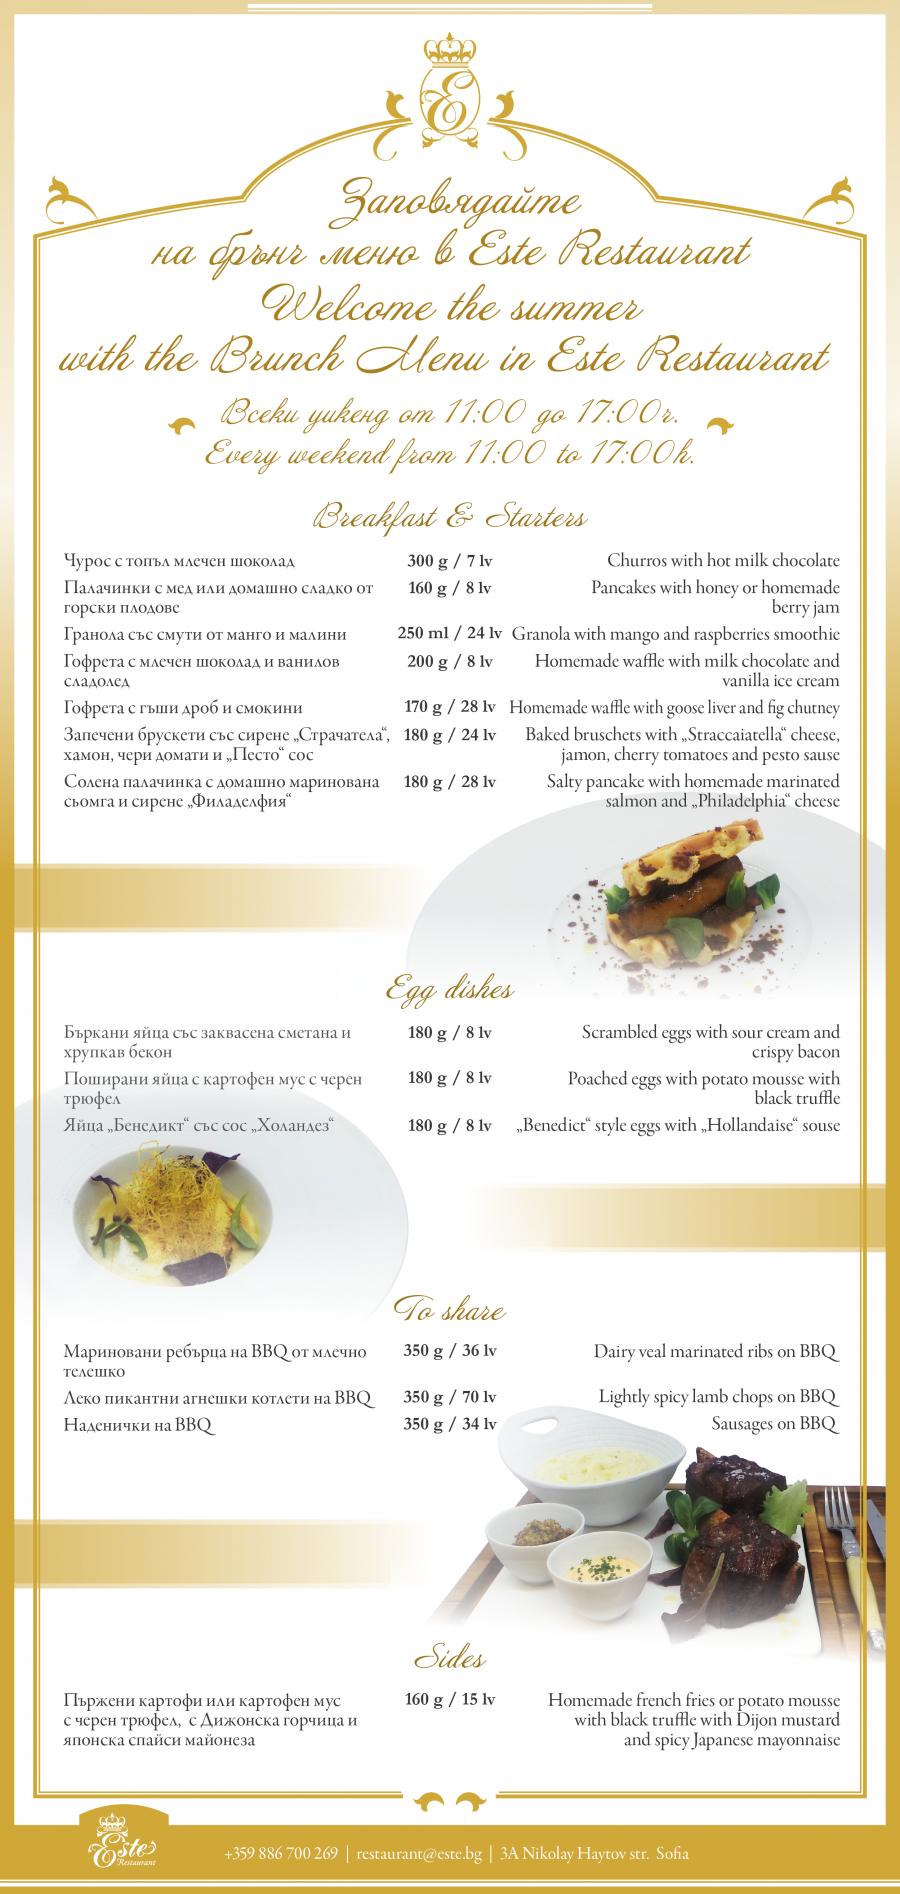 Este Restaurant with a special brunch menu every weekend